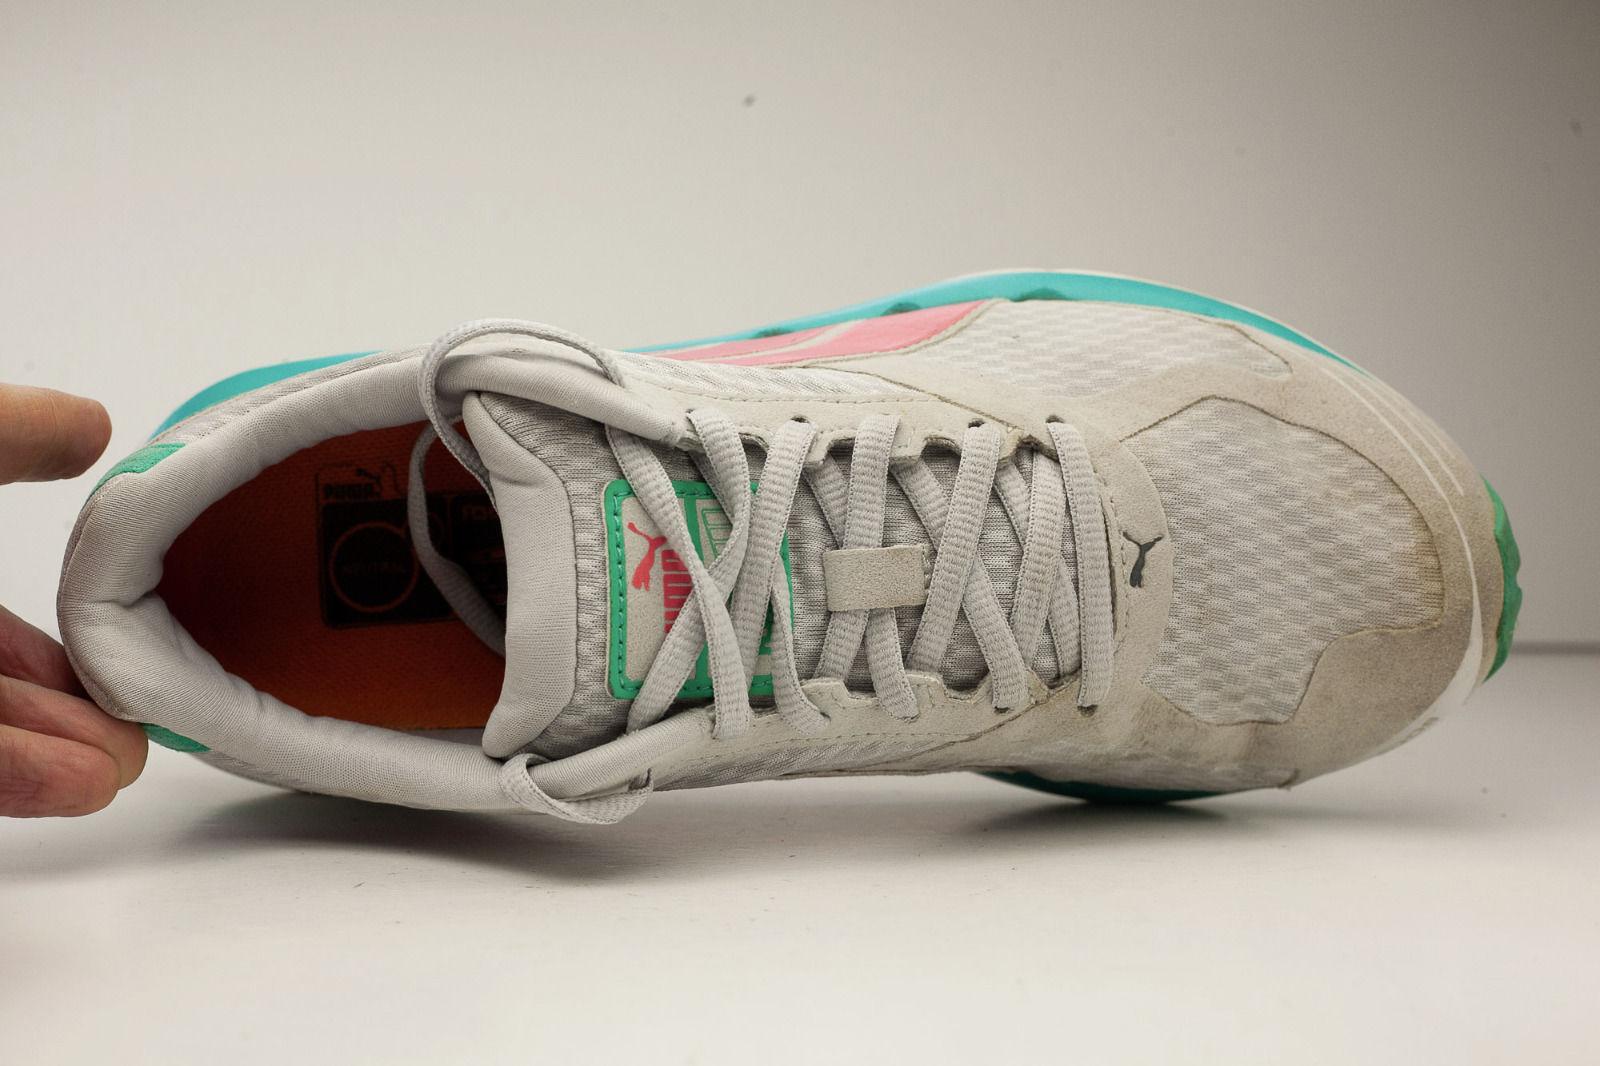 Puma Faas 700 V2 US 9 Running Shoe Women's